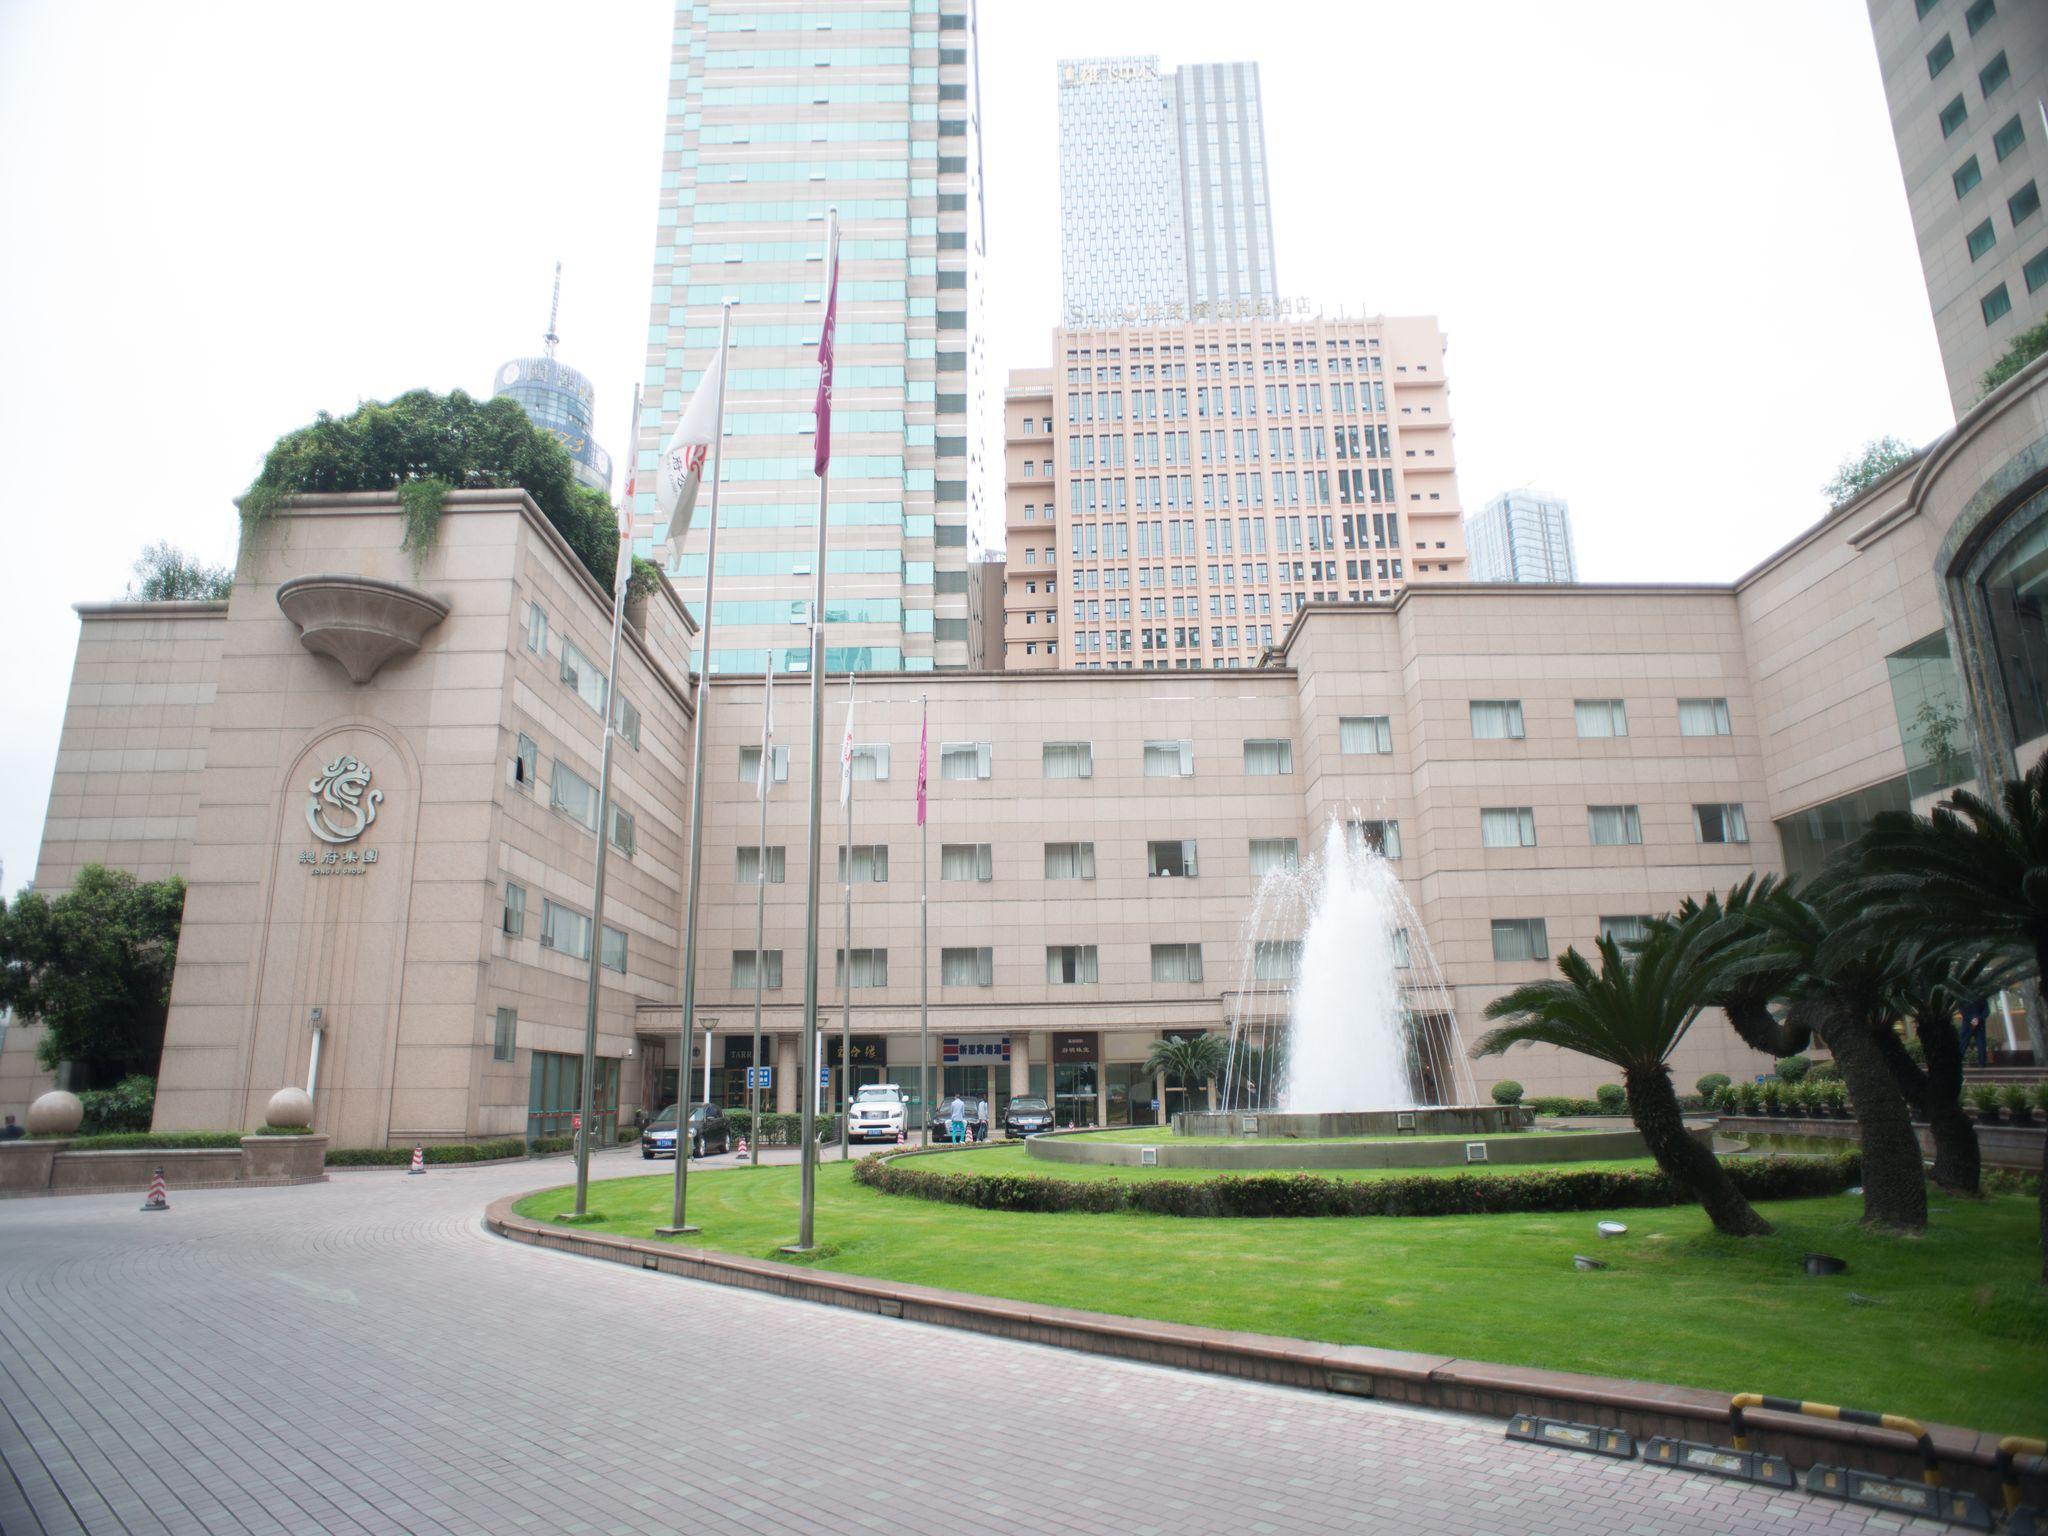 7 Days Premium Hotel Chengdu Yanshi Kou Branch Chunxi Road Commercial Area Hotels Chengdu China Hotels In